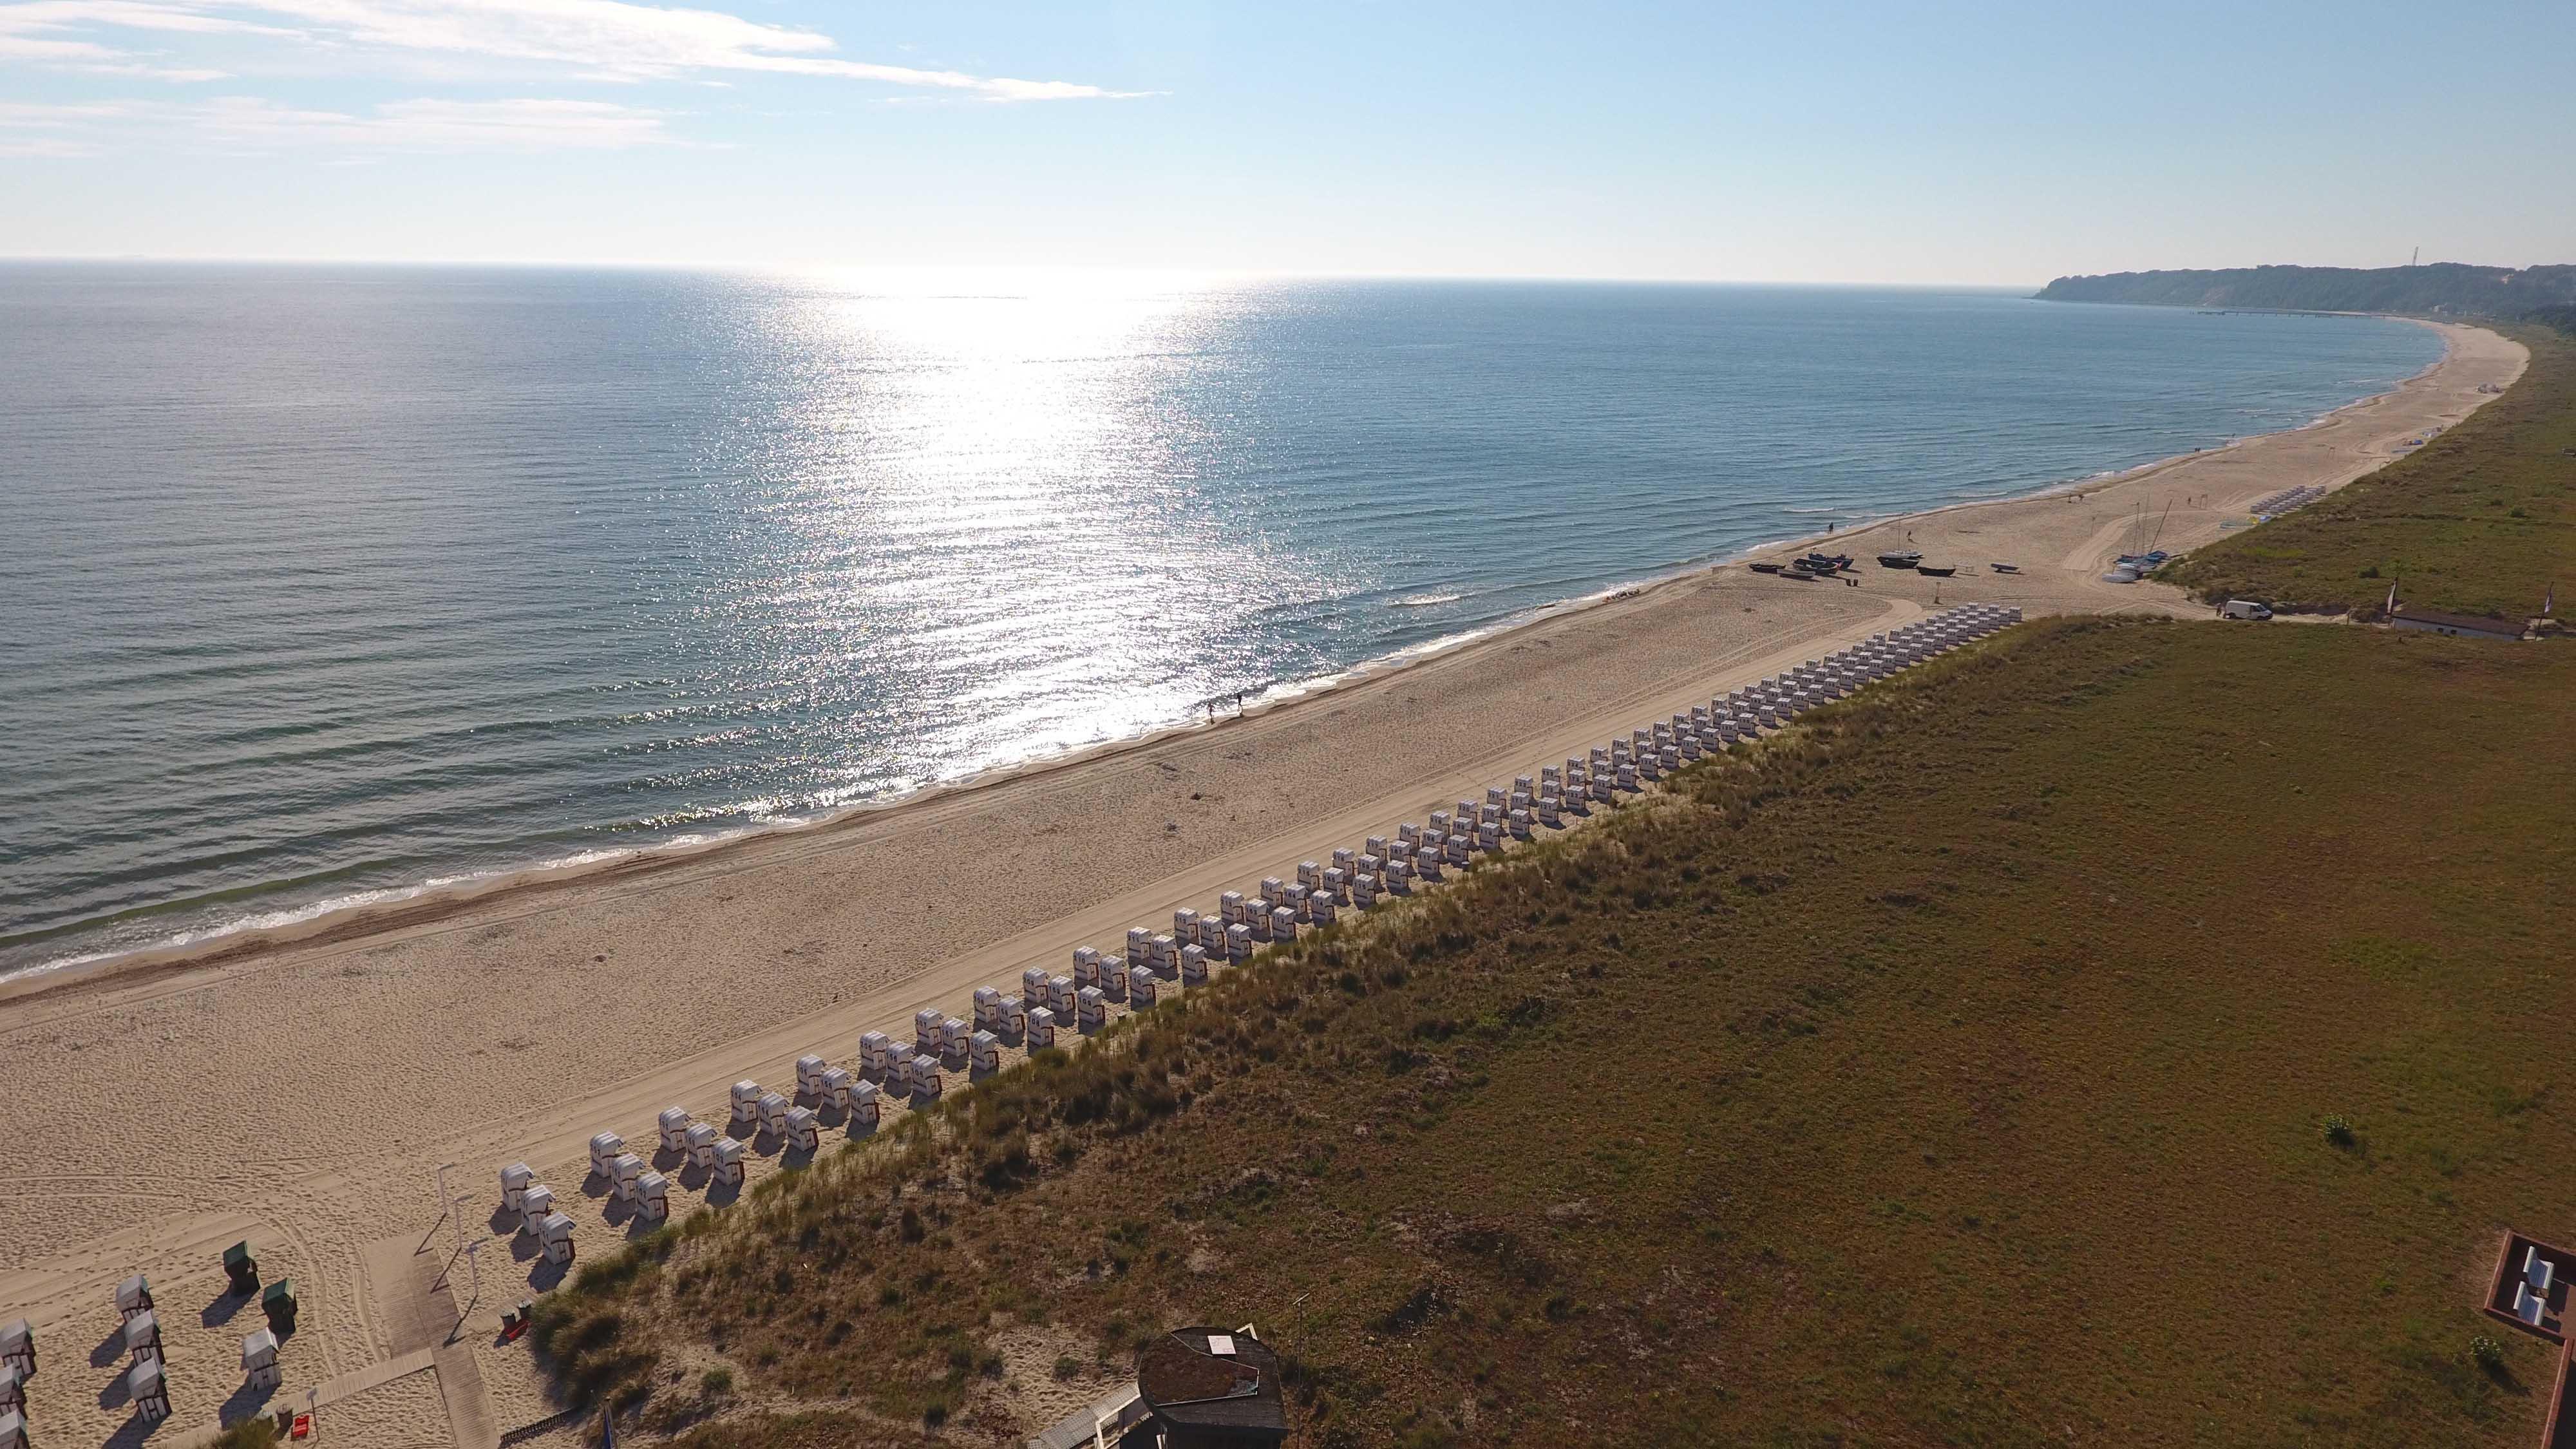 Luftbild vom Strand im Sommer